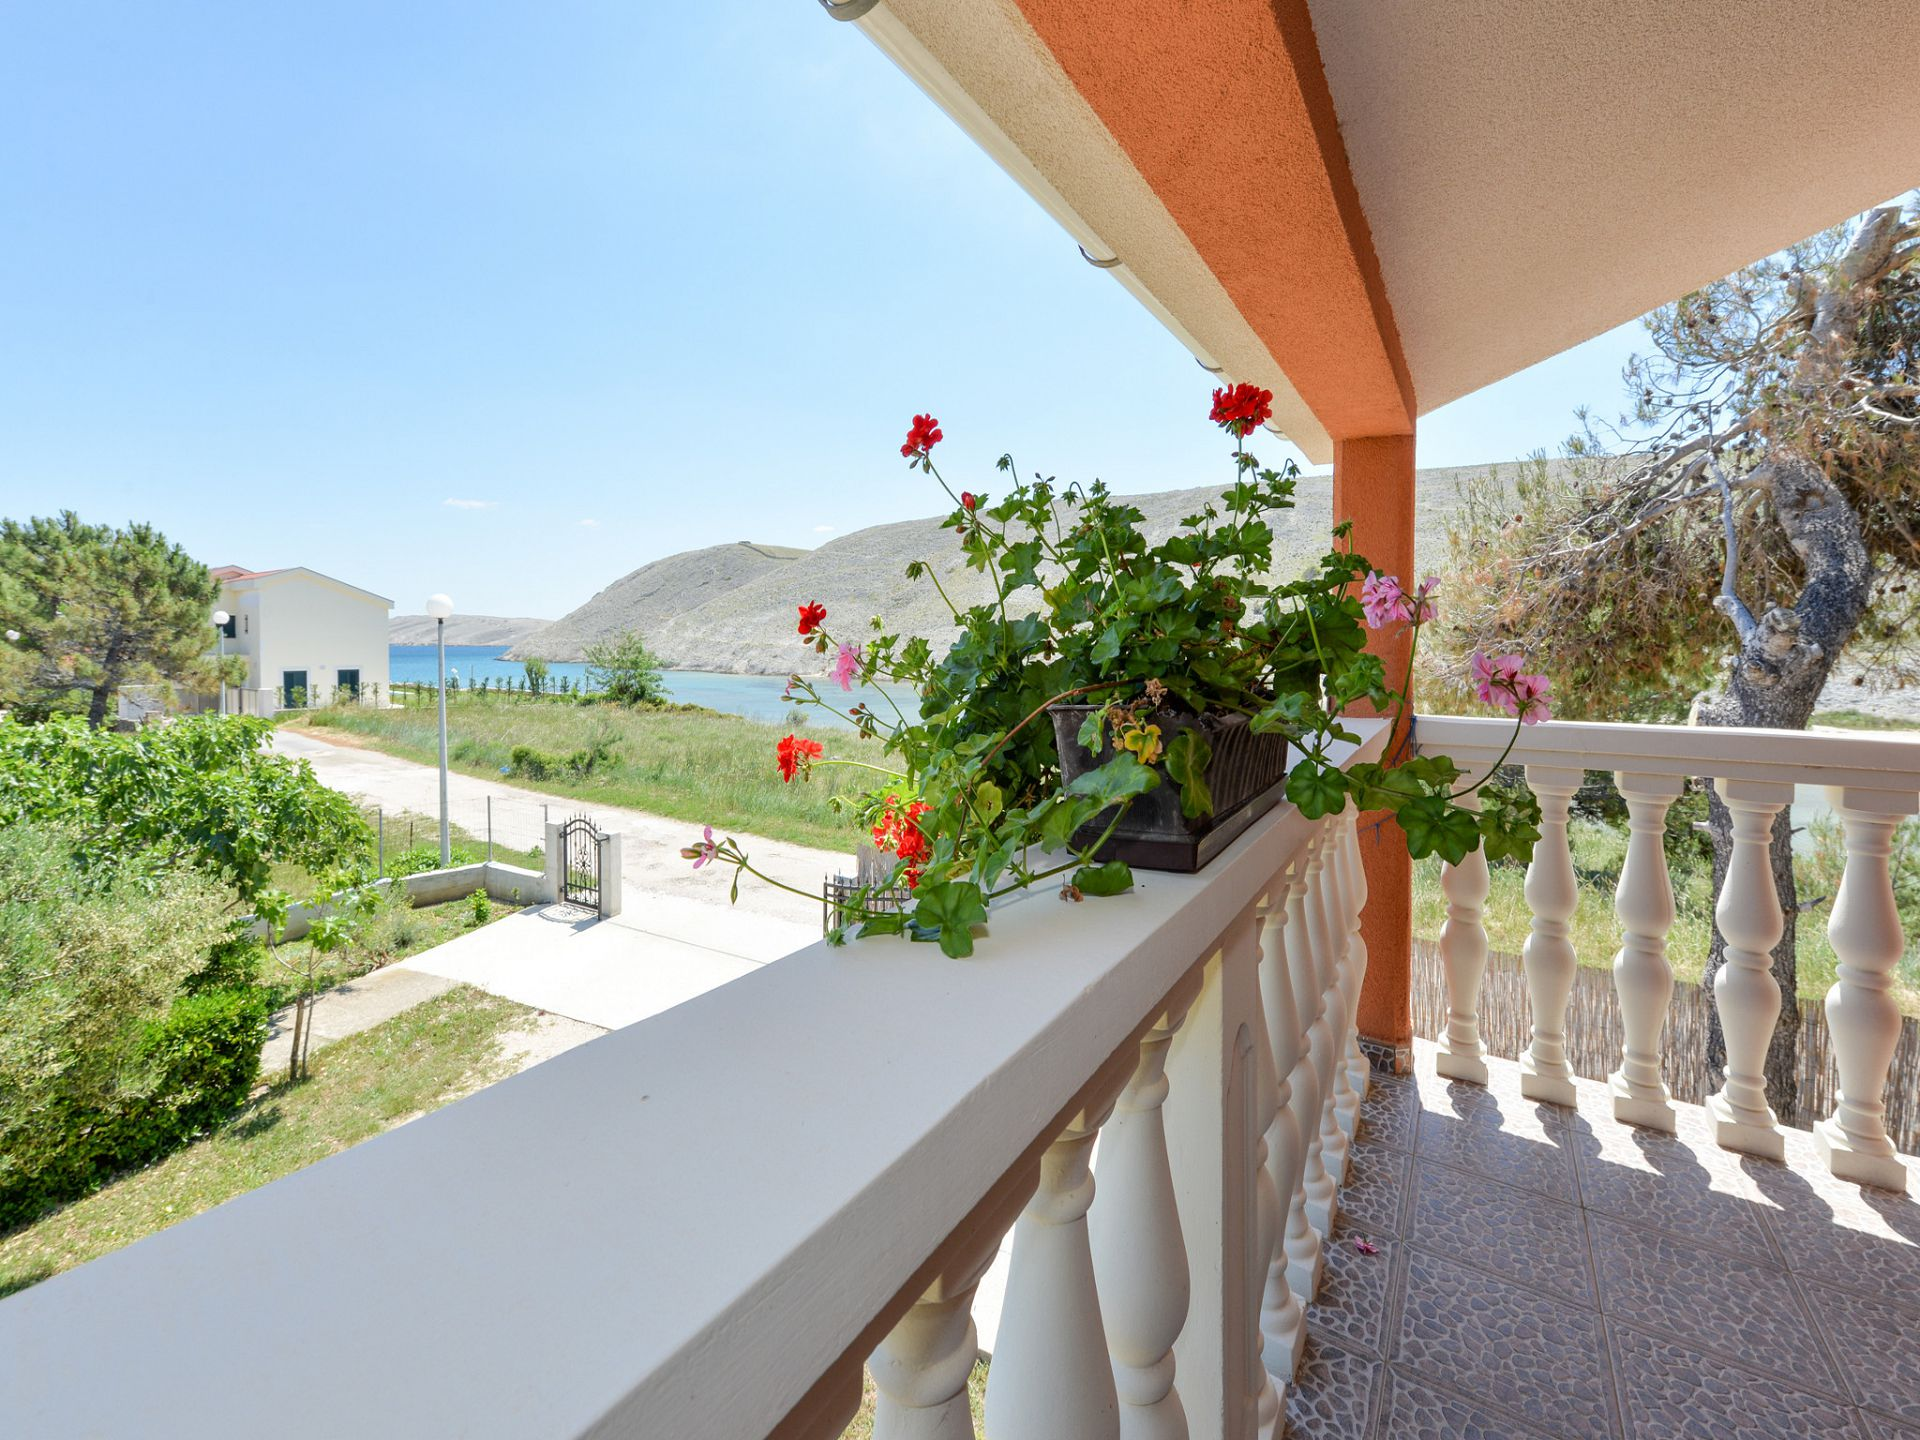 5727 - Vlasici - Holiday houses, villas Croatia